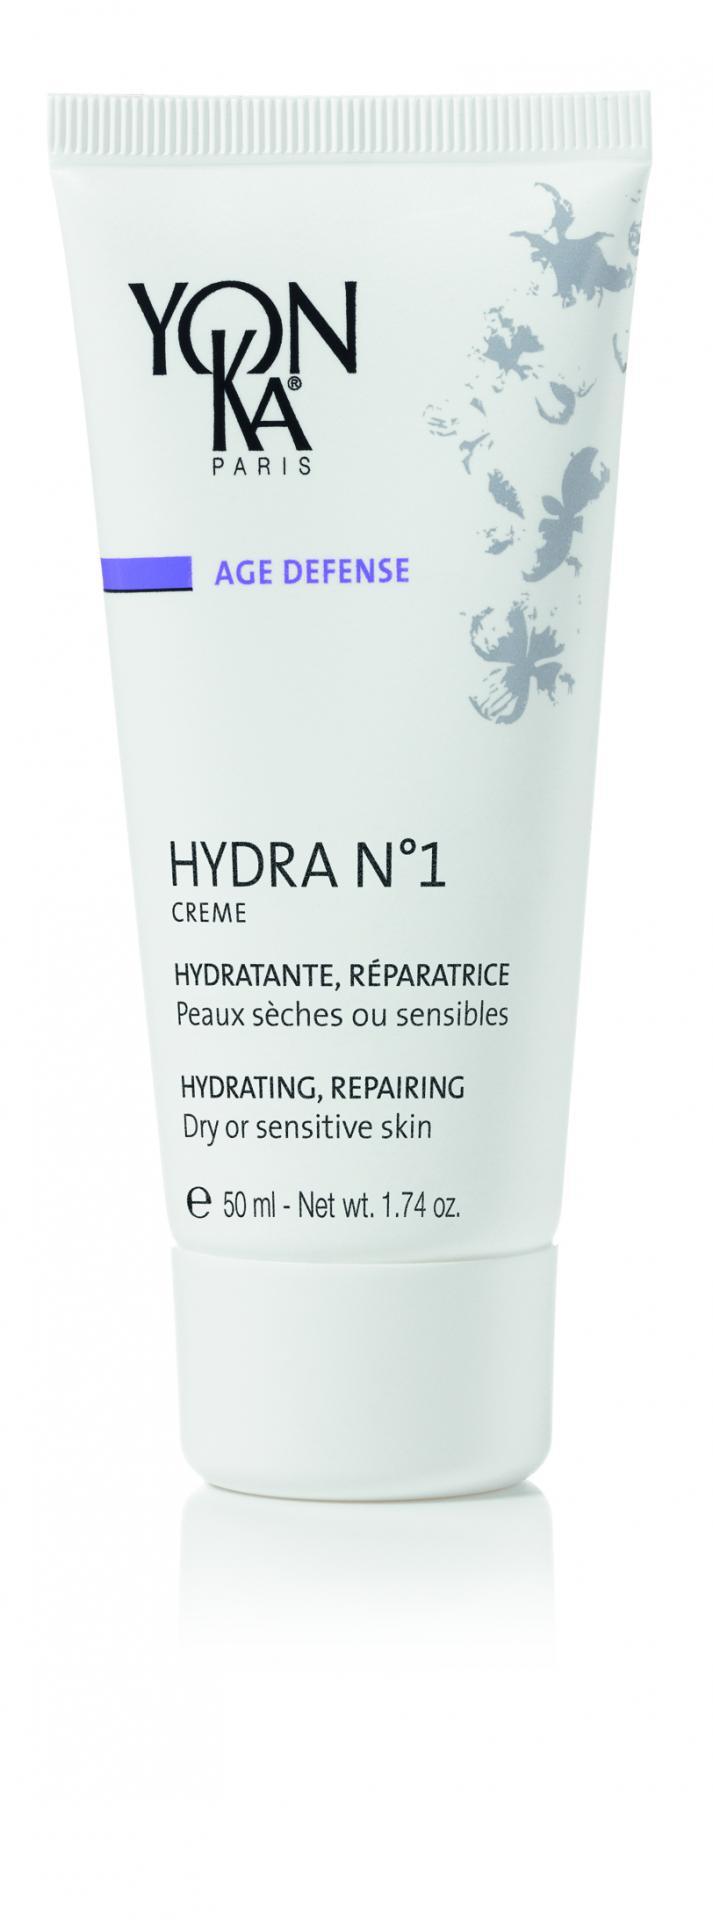 Hydra n 1 creme